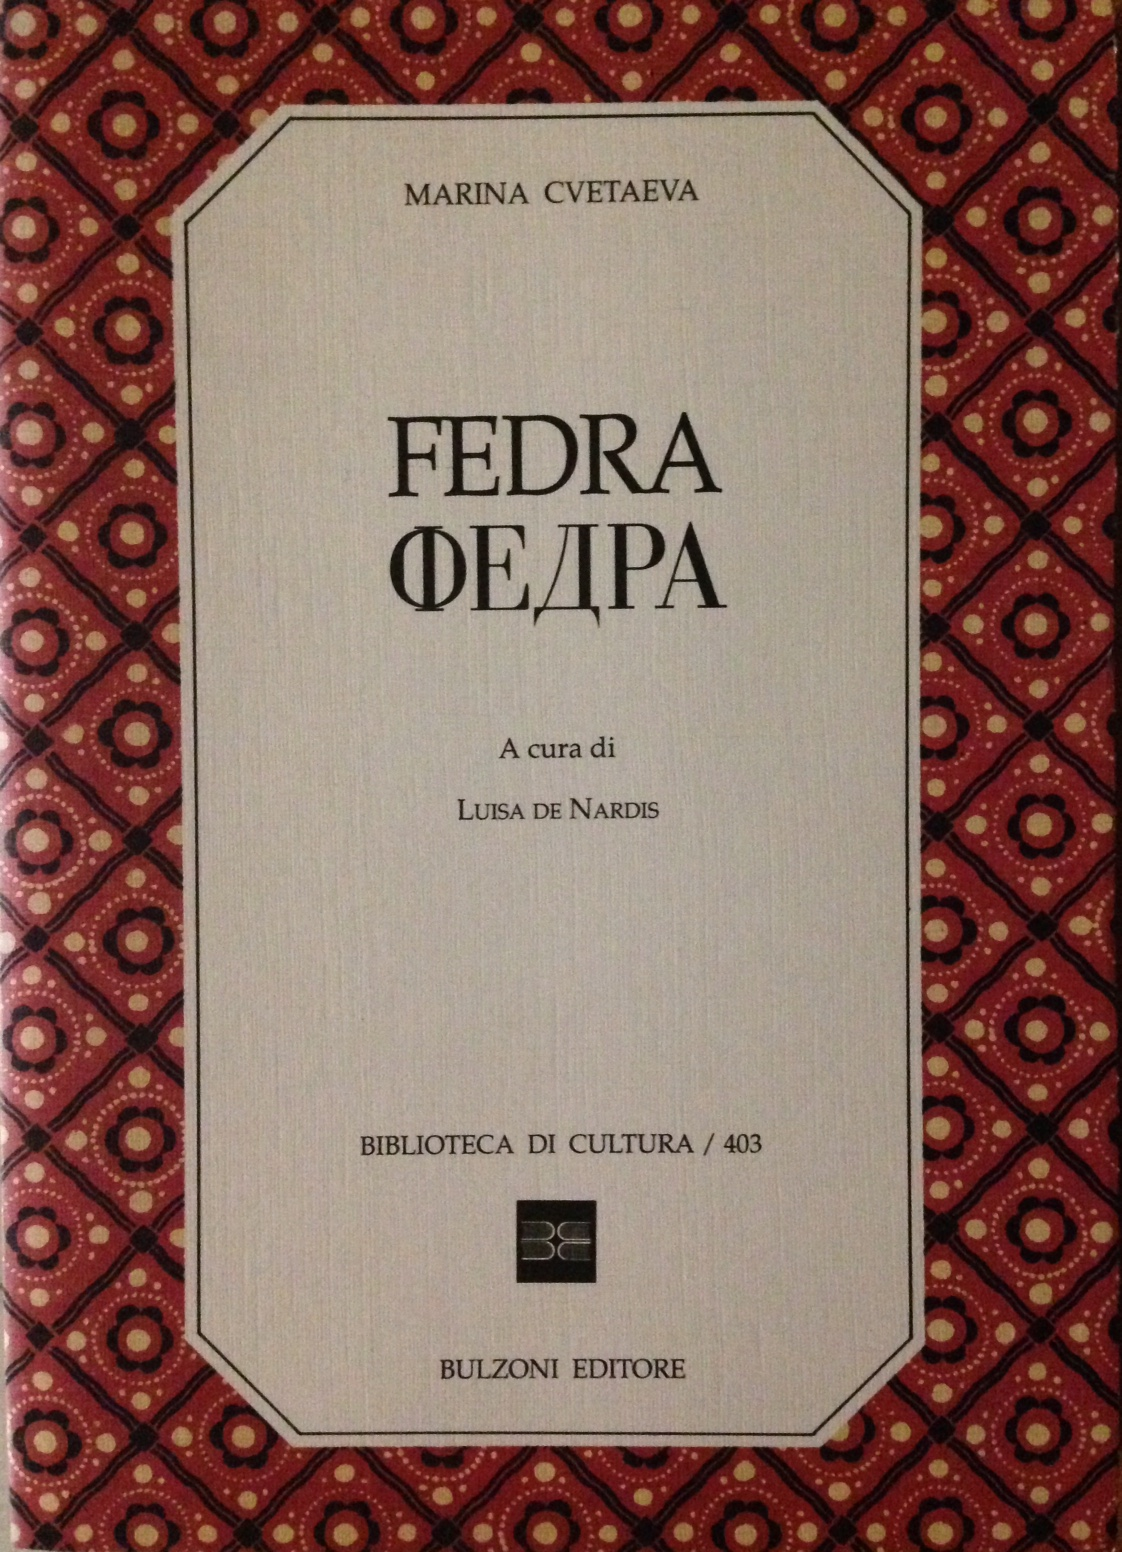 Fedra = Phedra